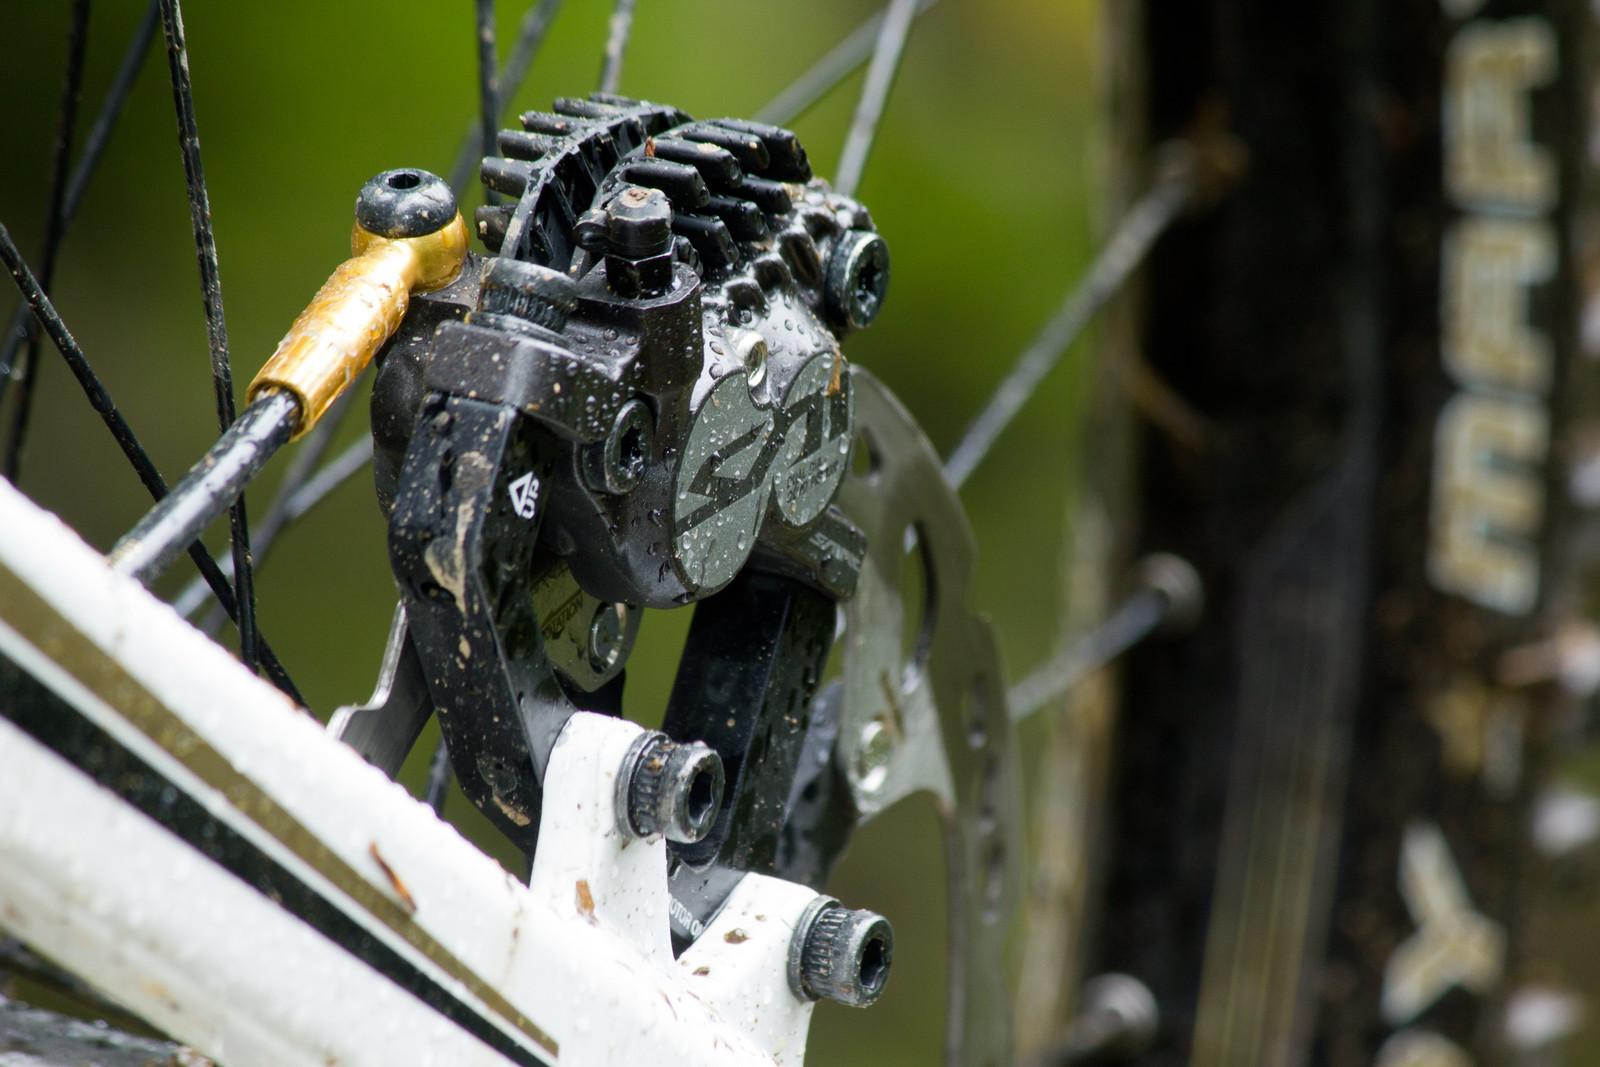 Shimano Saint M820 Brake Caliper - First Look: Vital's Pre-Production Shimano Saint Equipped V-10 Carbon - Mountain Biking Pictures - Vital MTB